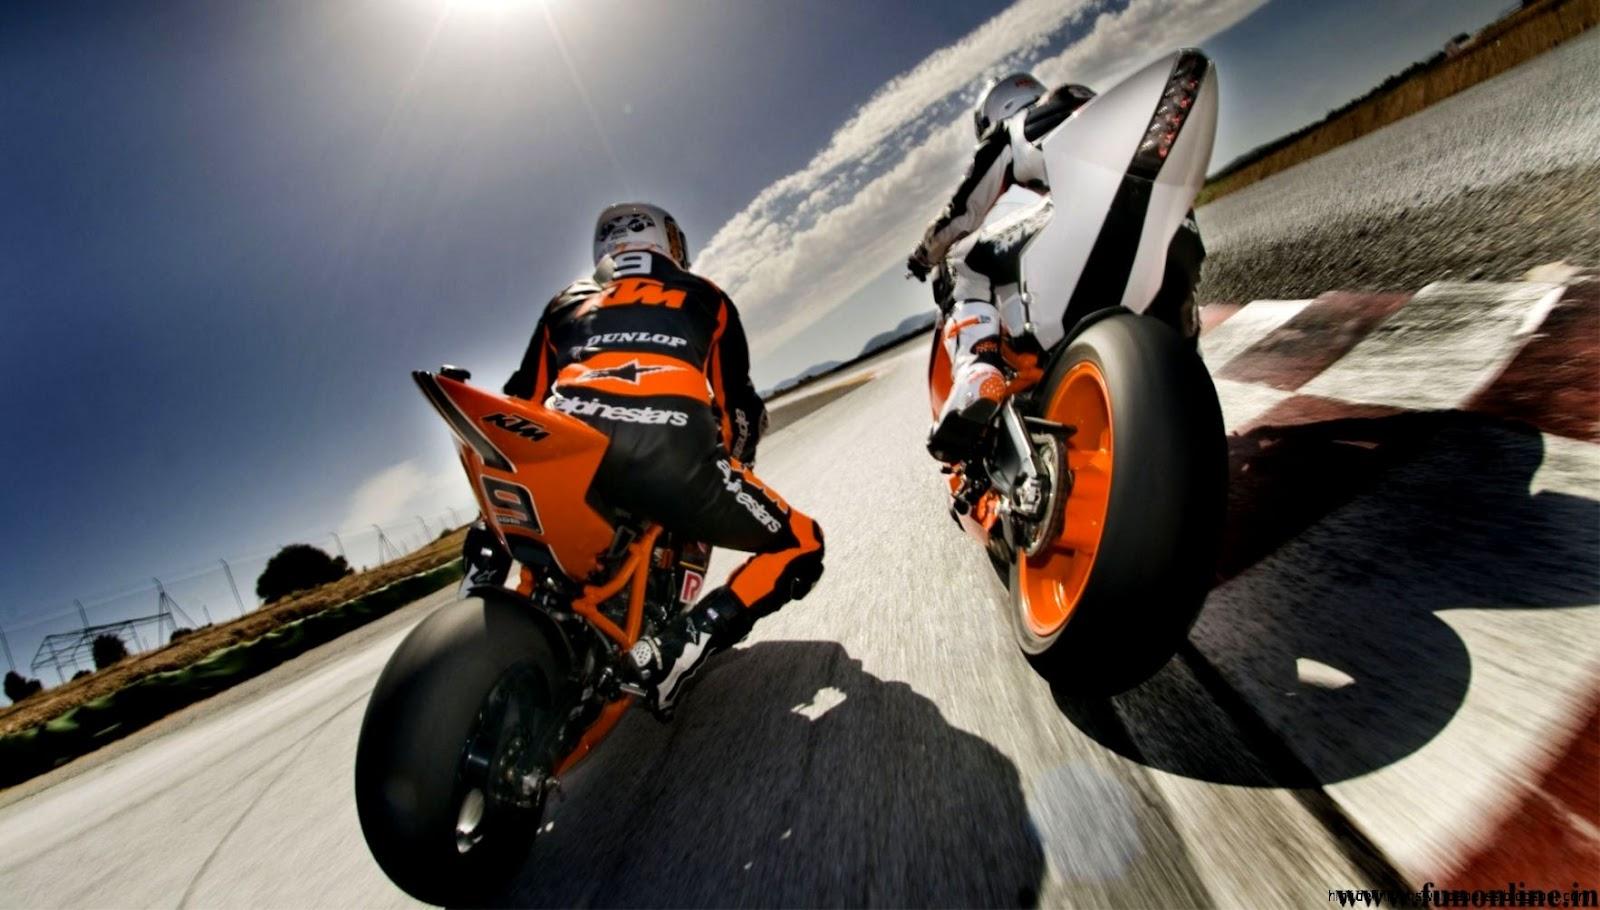 Ktm dirt bike racing